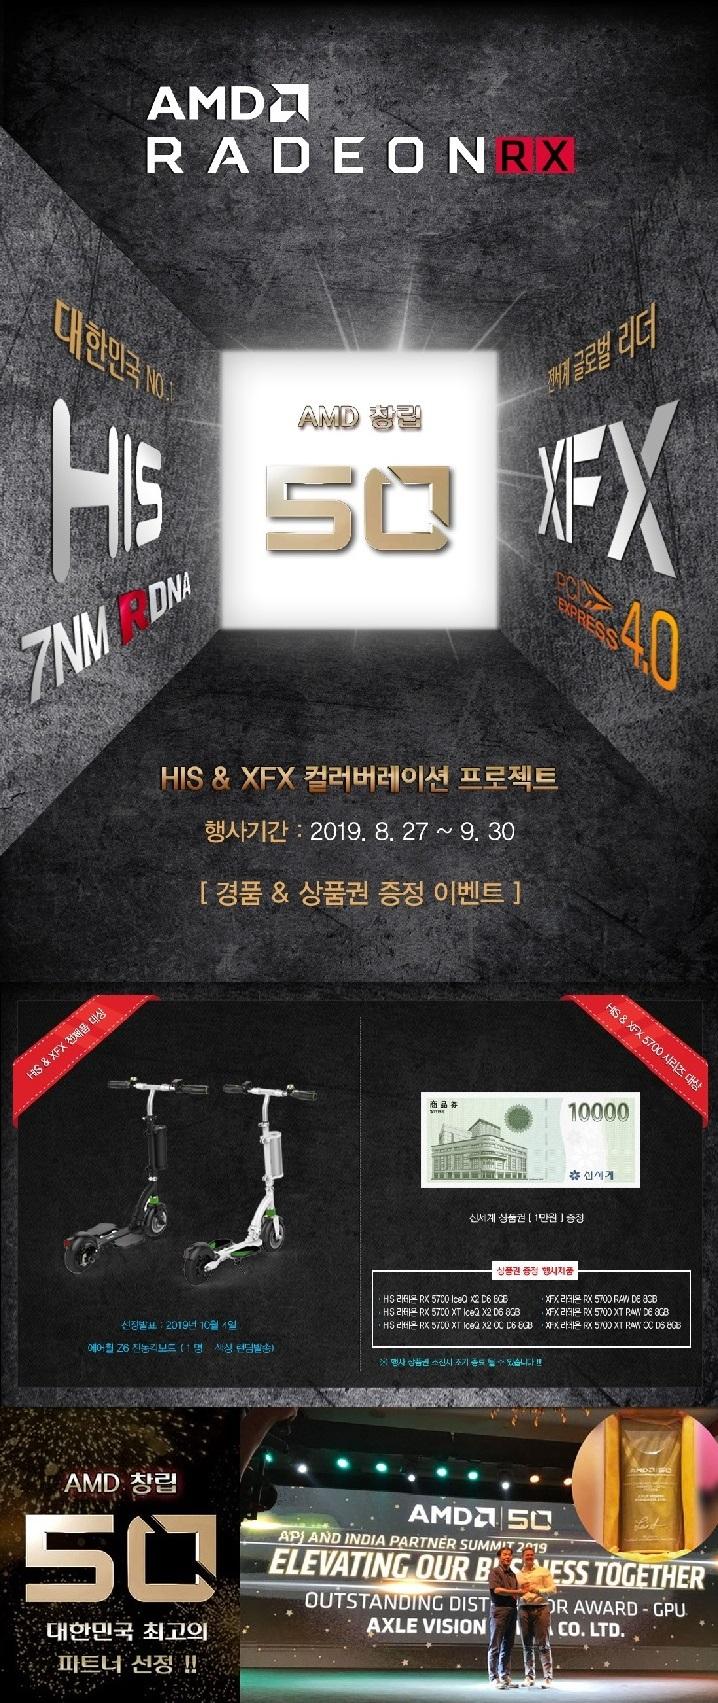 HIS & XFX 컬러버레이션 행사